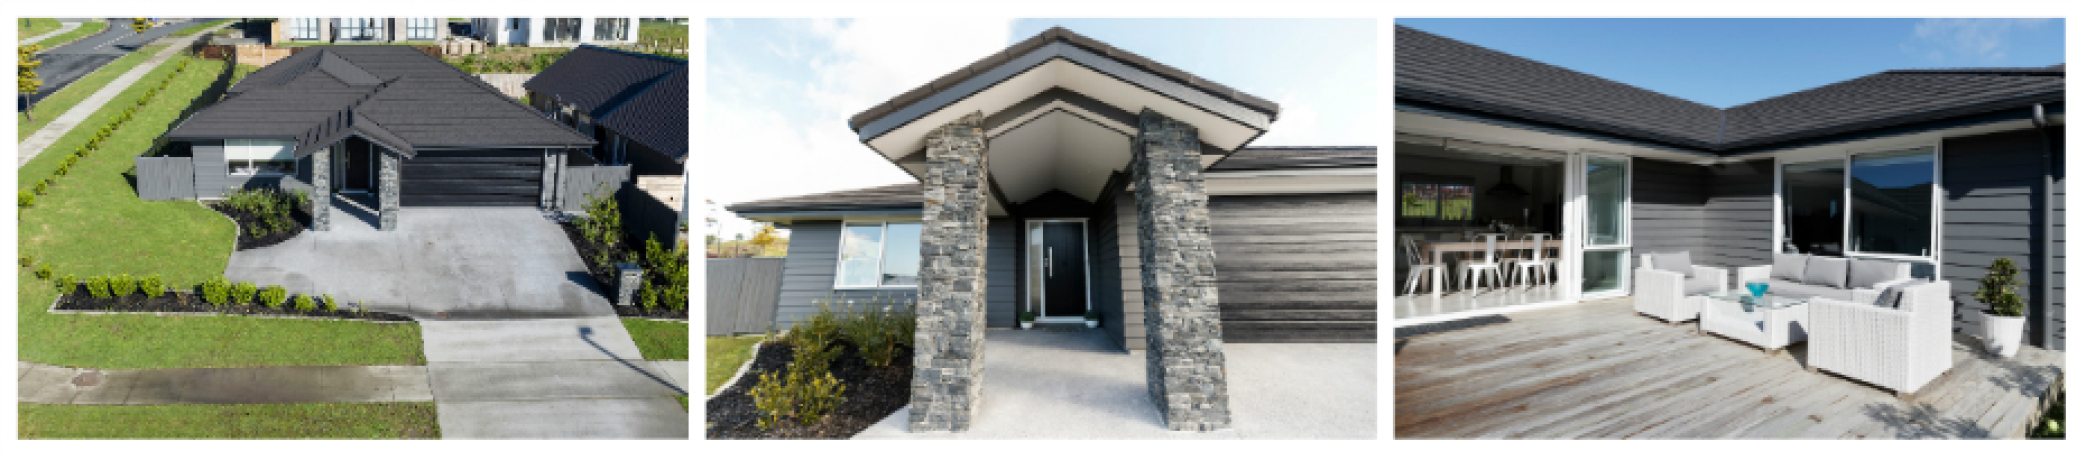 Generation Homes Package Build in Norfolk Downs II Cambridge